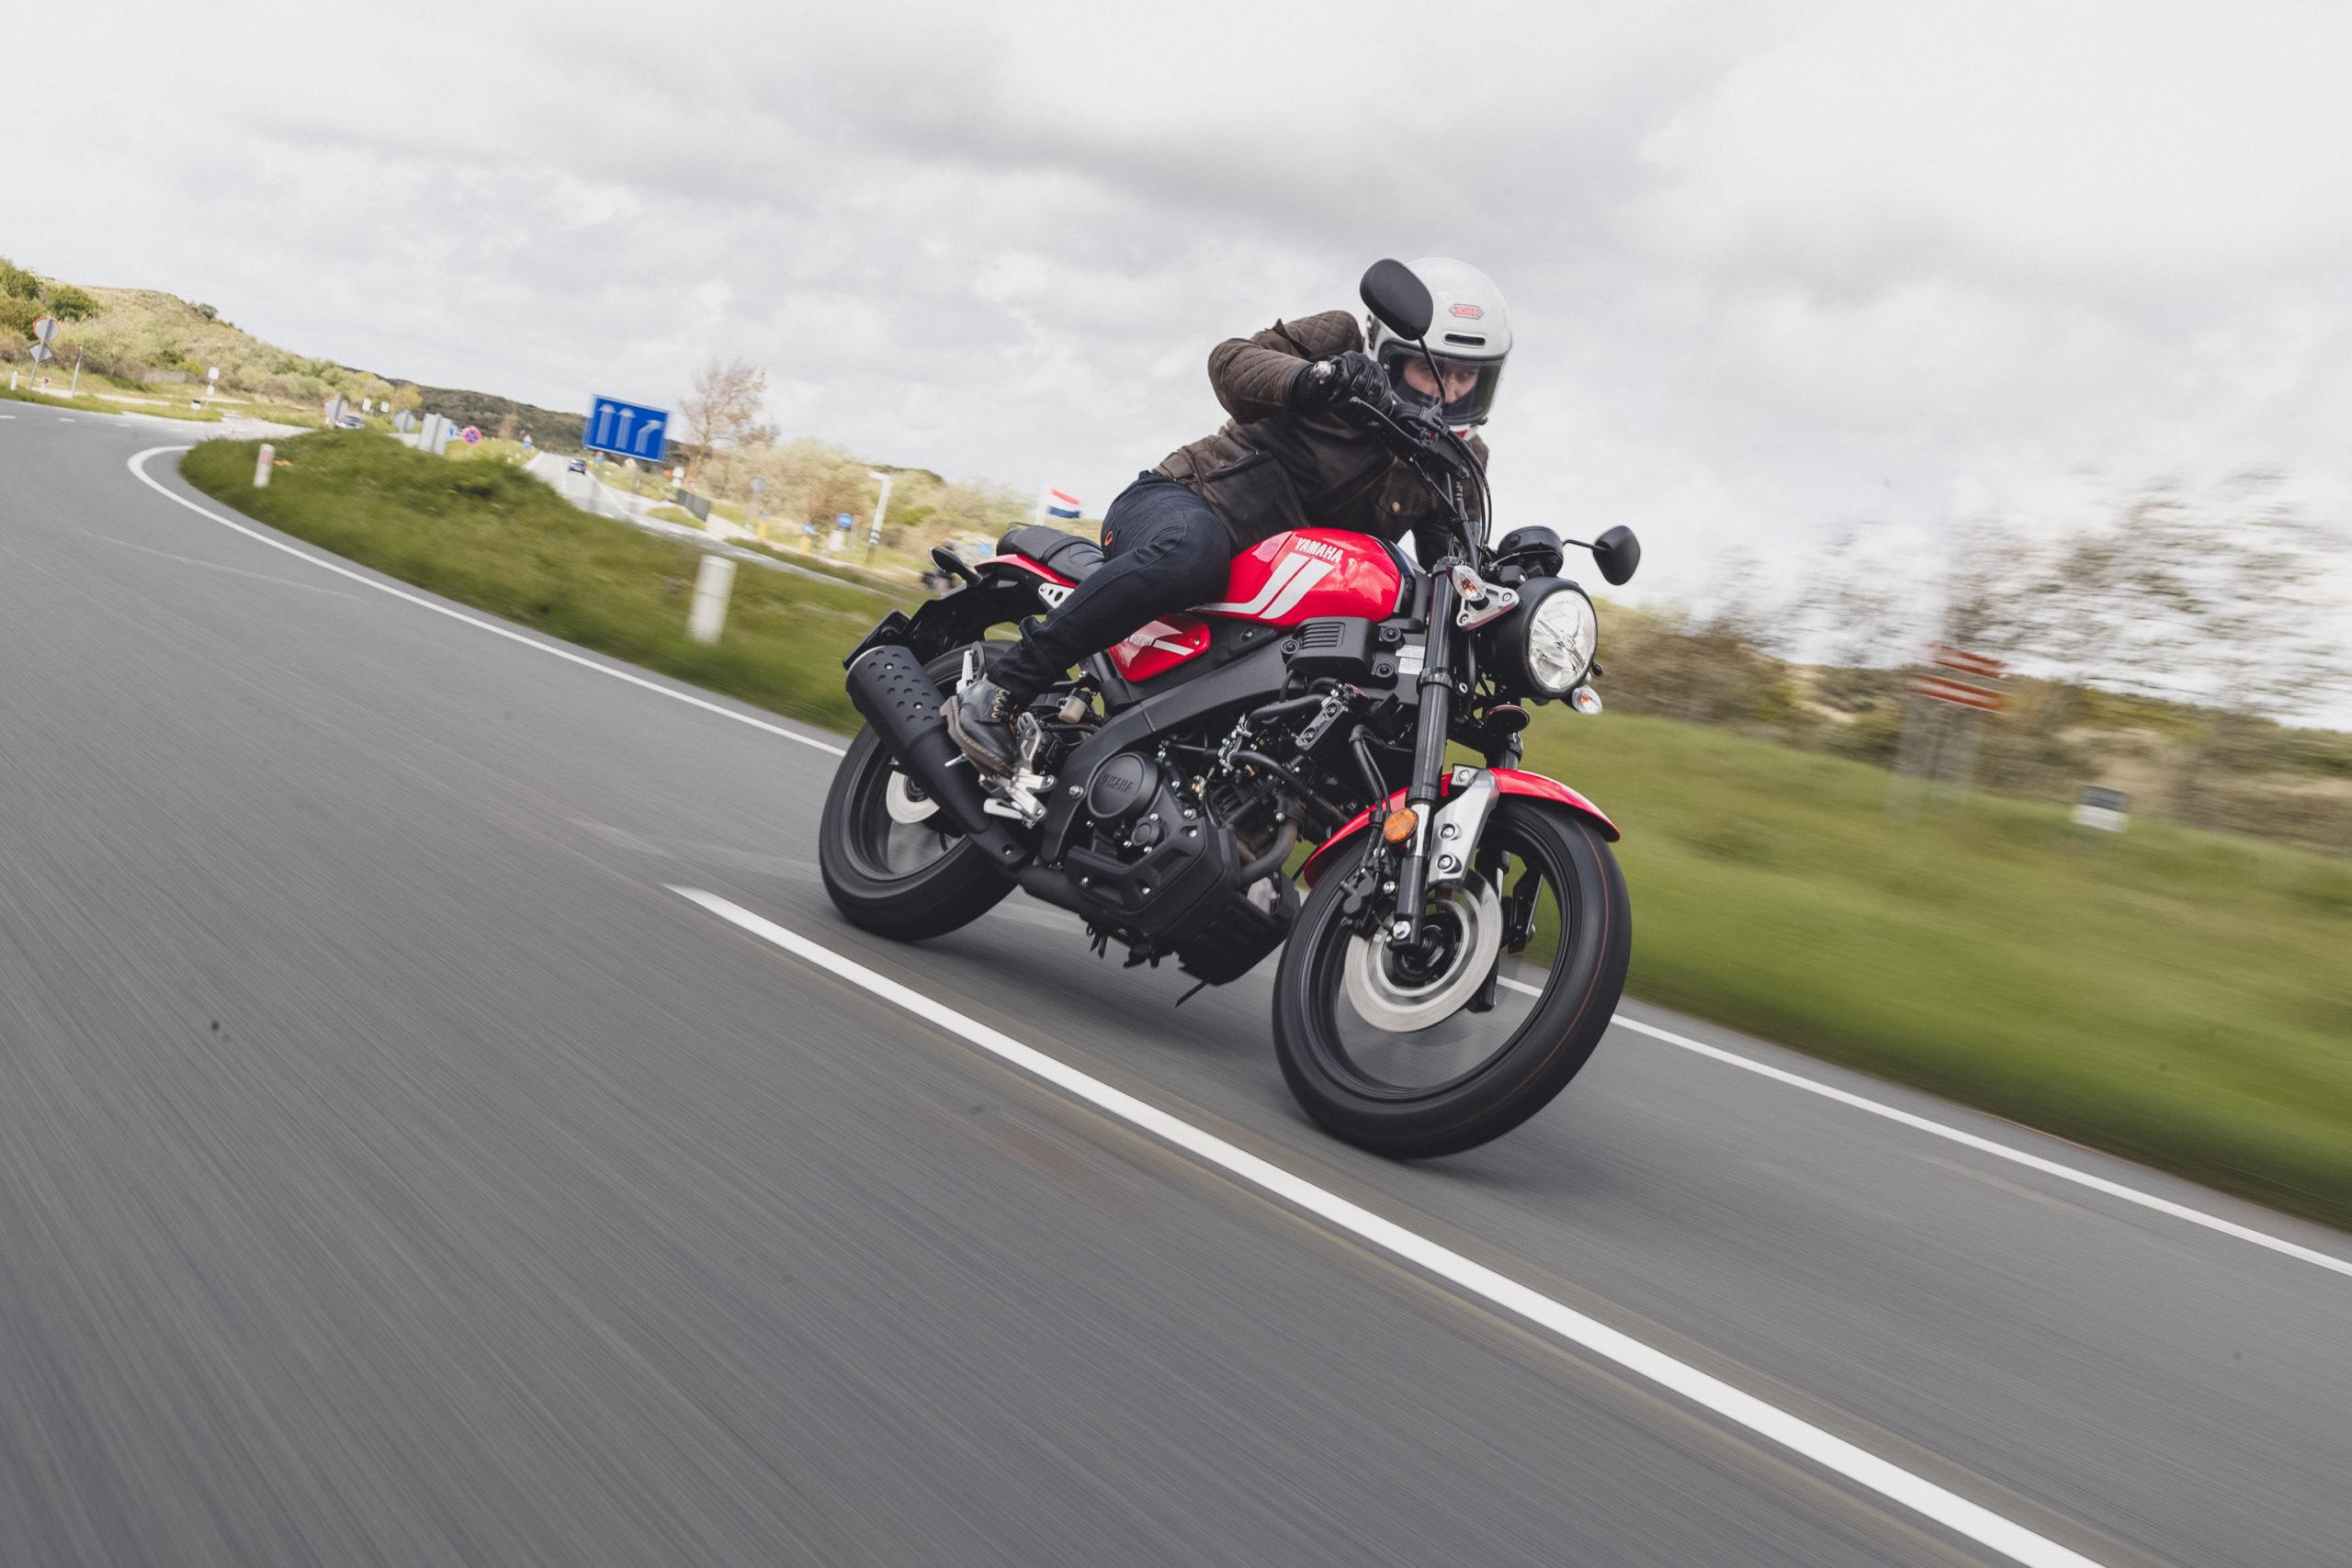 Yamaha XSR 125 test moto 125 vintage